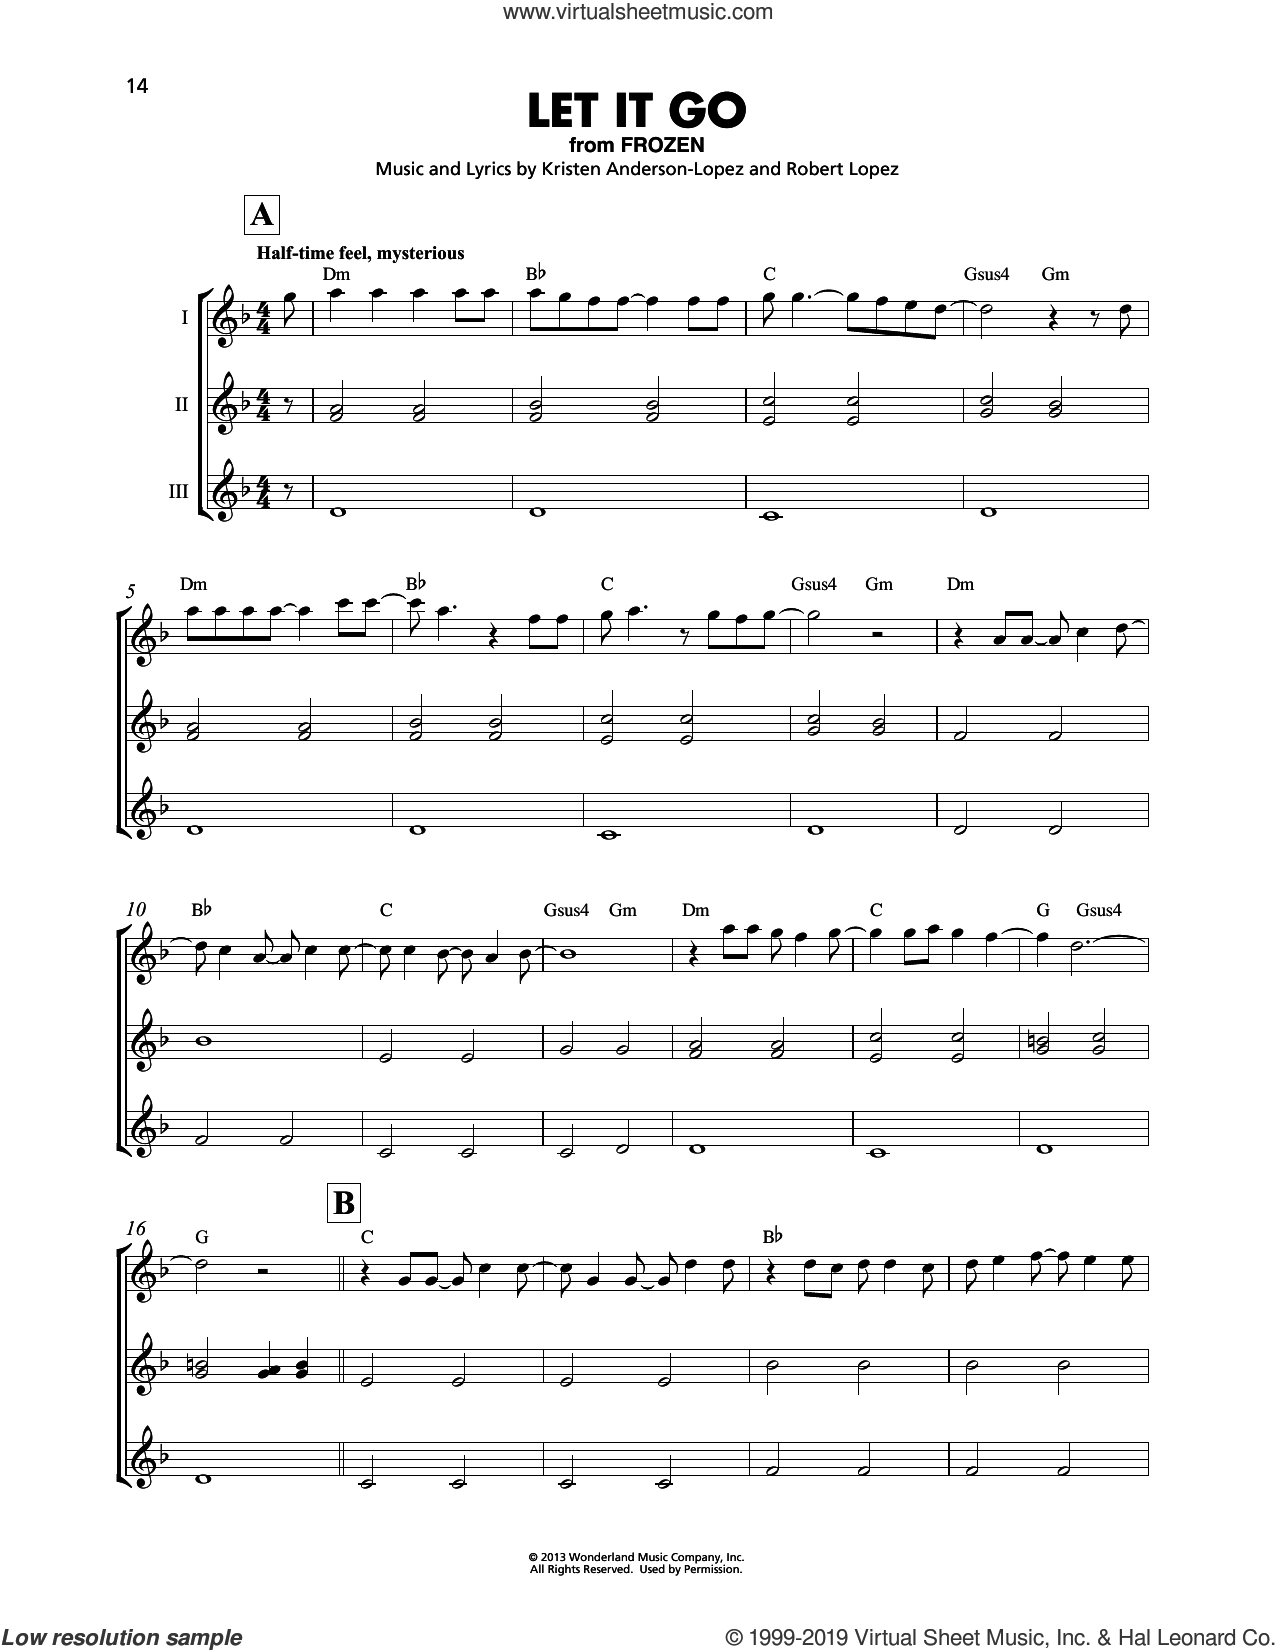 Let It Go (from Frozen) sheet music for ukulele ensemble by Idina Menzel, Kristen Anderson-Lopez and Robert Lopez, intermediate skill level